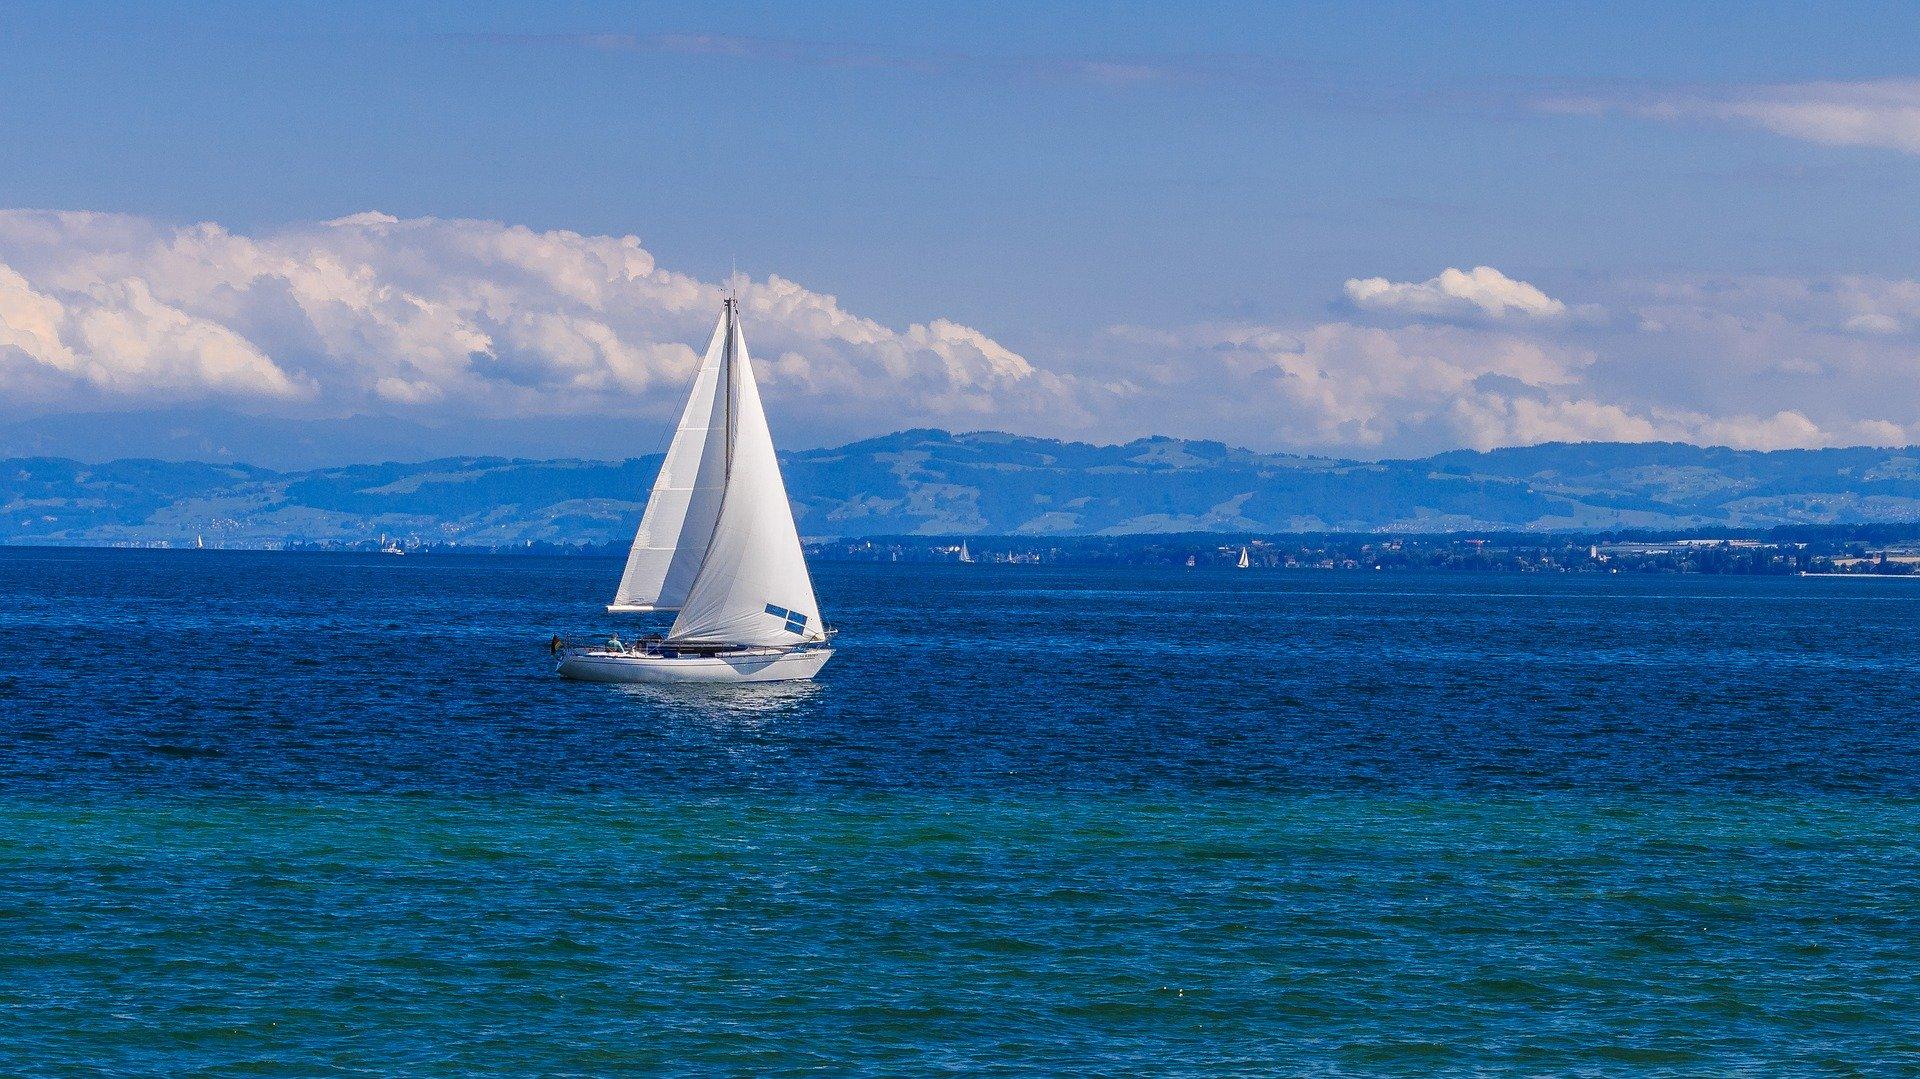 Sailing boat near Radolfzell on Lake Constance